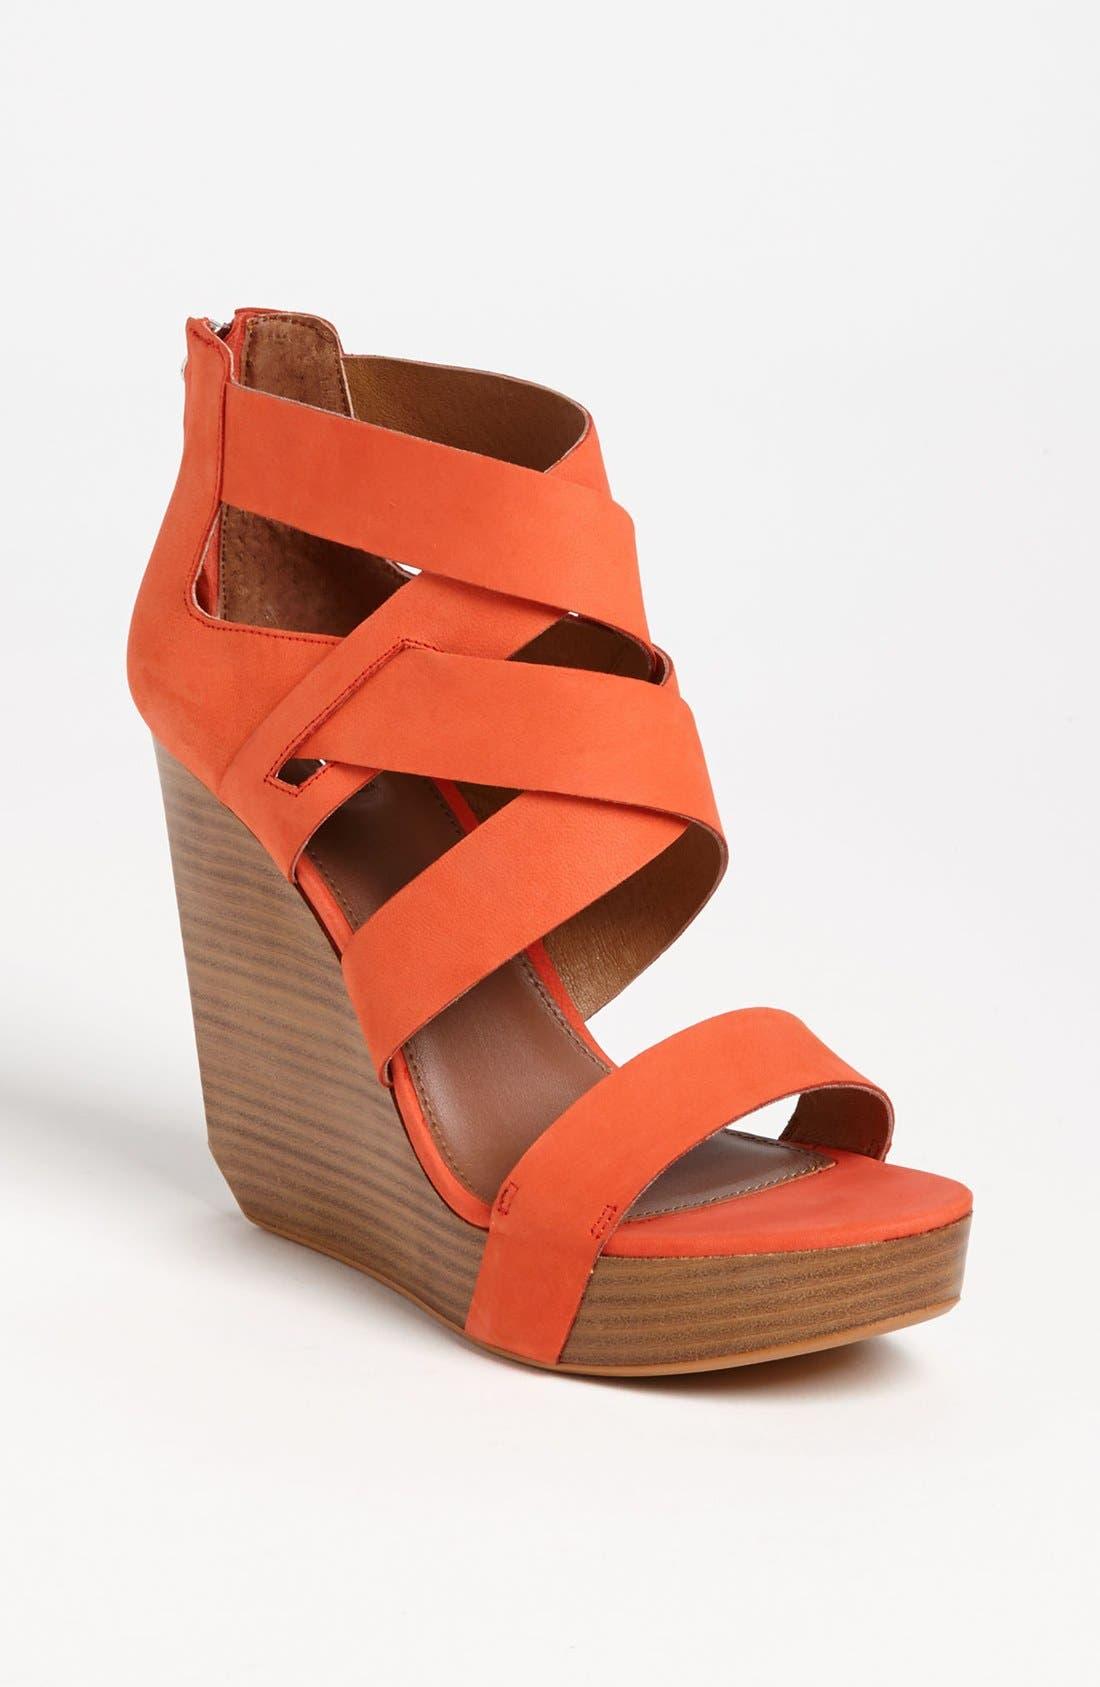 Alternate Image 1 Selected - Matiko 'Crisscross' Wedge Sandal